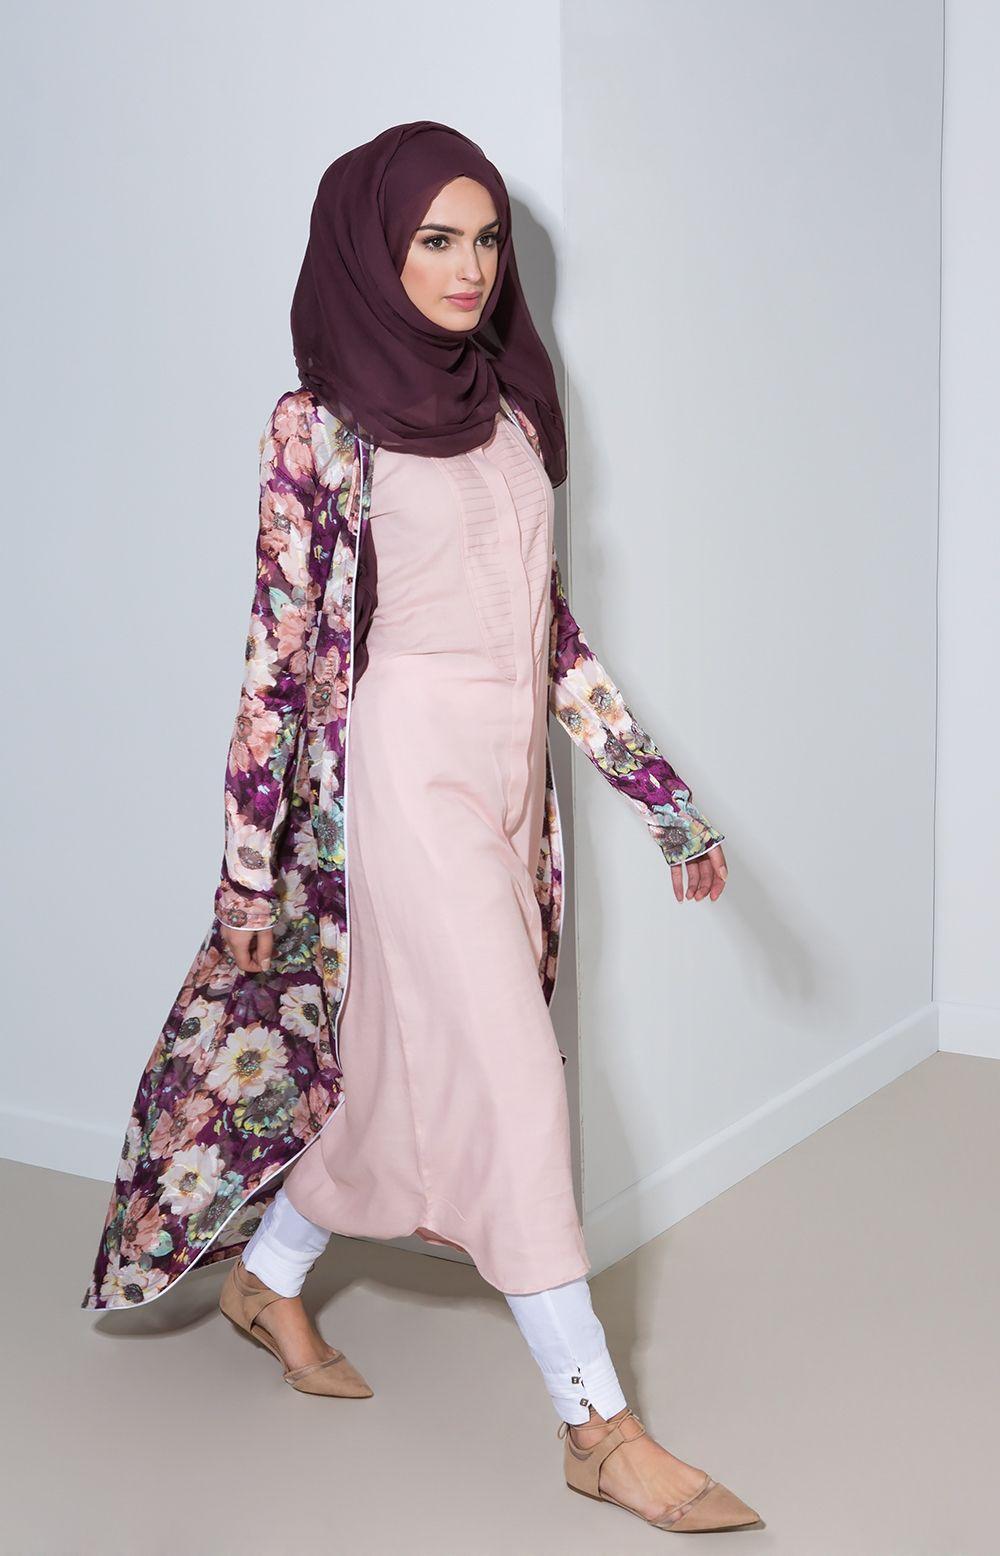 aab-uk-purple-orchid-kimono-s5kimpo-z-RCwU.jpg (5×5